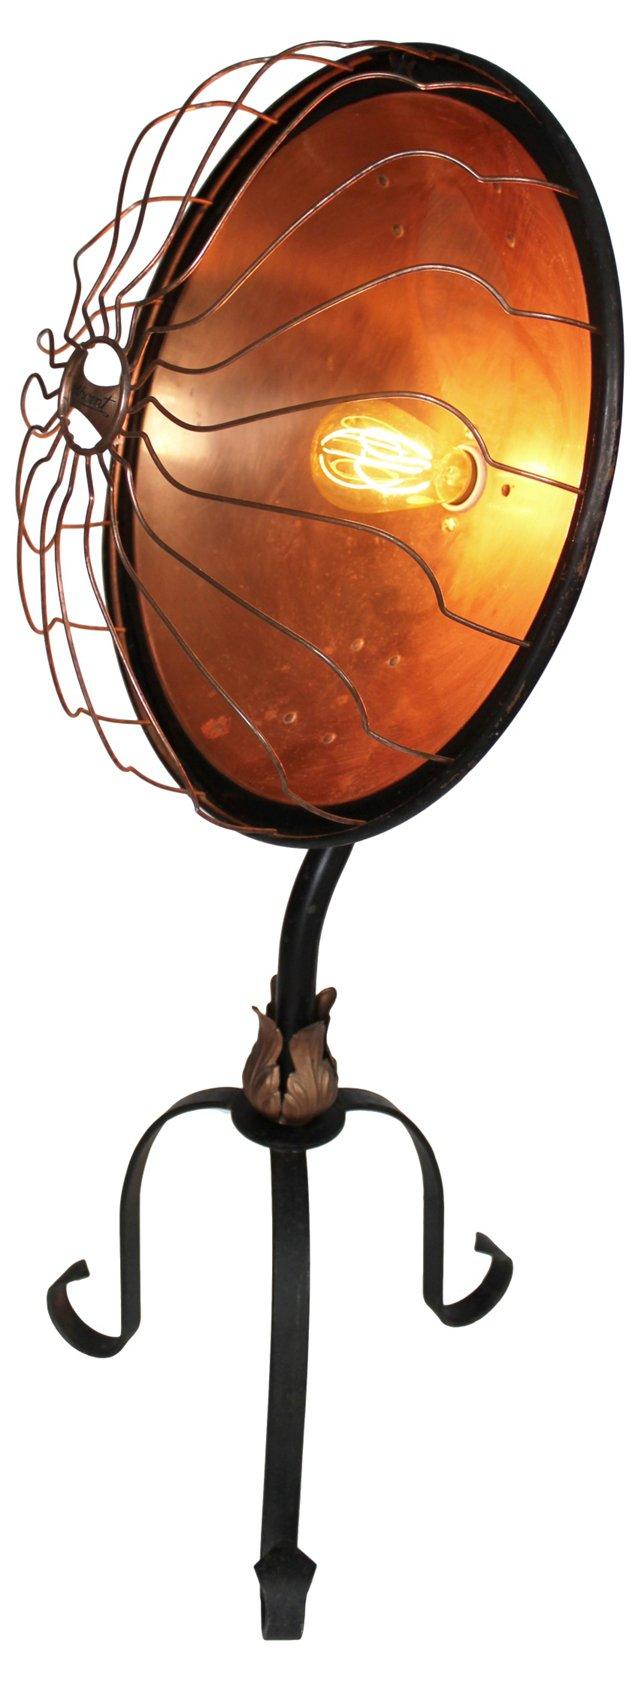 Early-1900s Copper Pedestal Floor Lamp